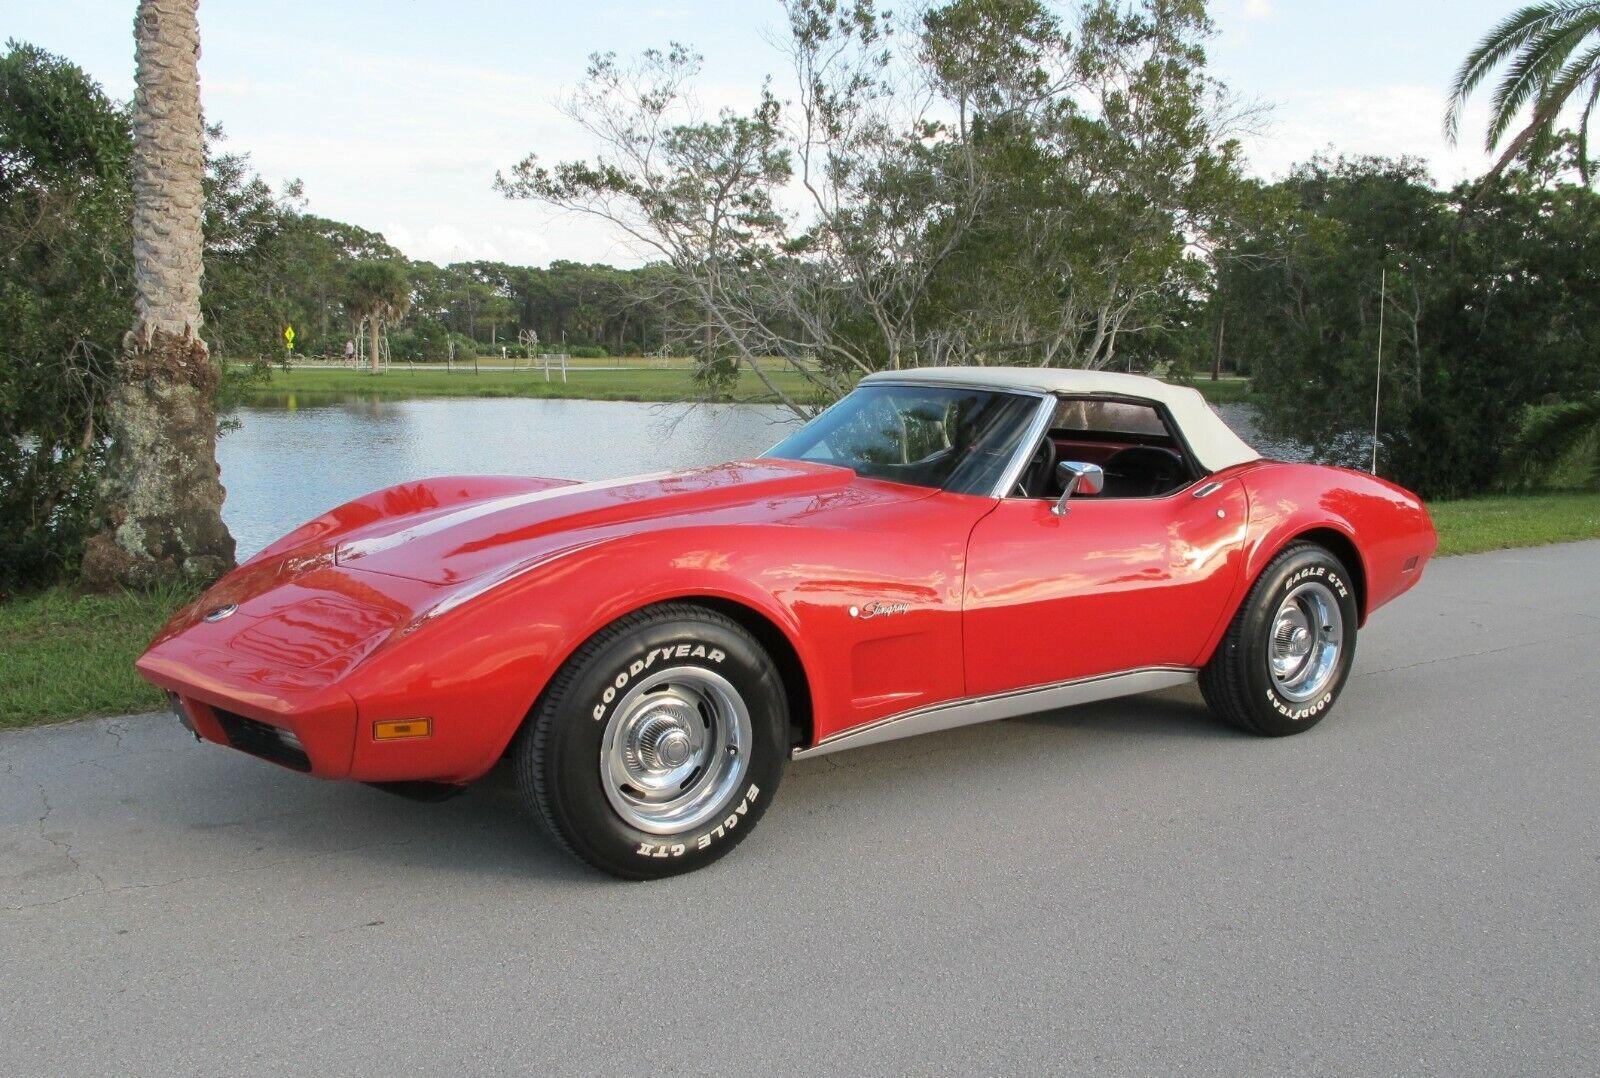 1974 Red Chevrolet Corvette   | C3 Corvette Photo 1